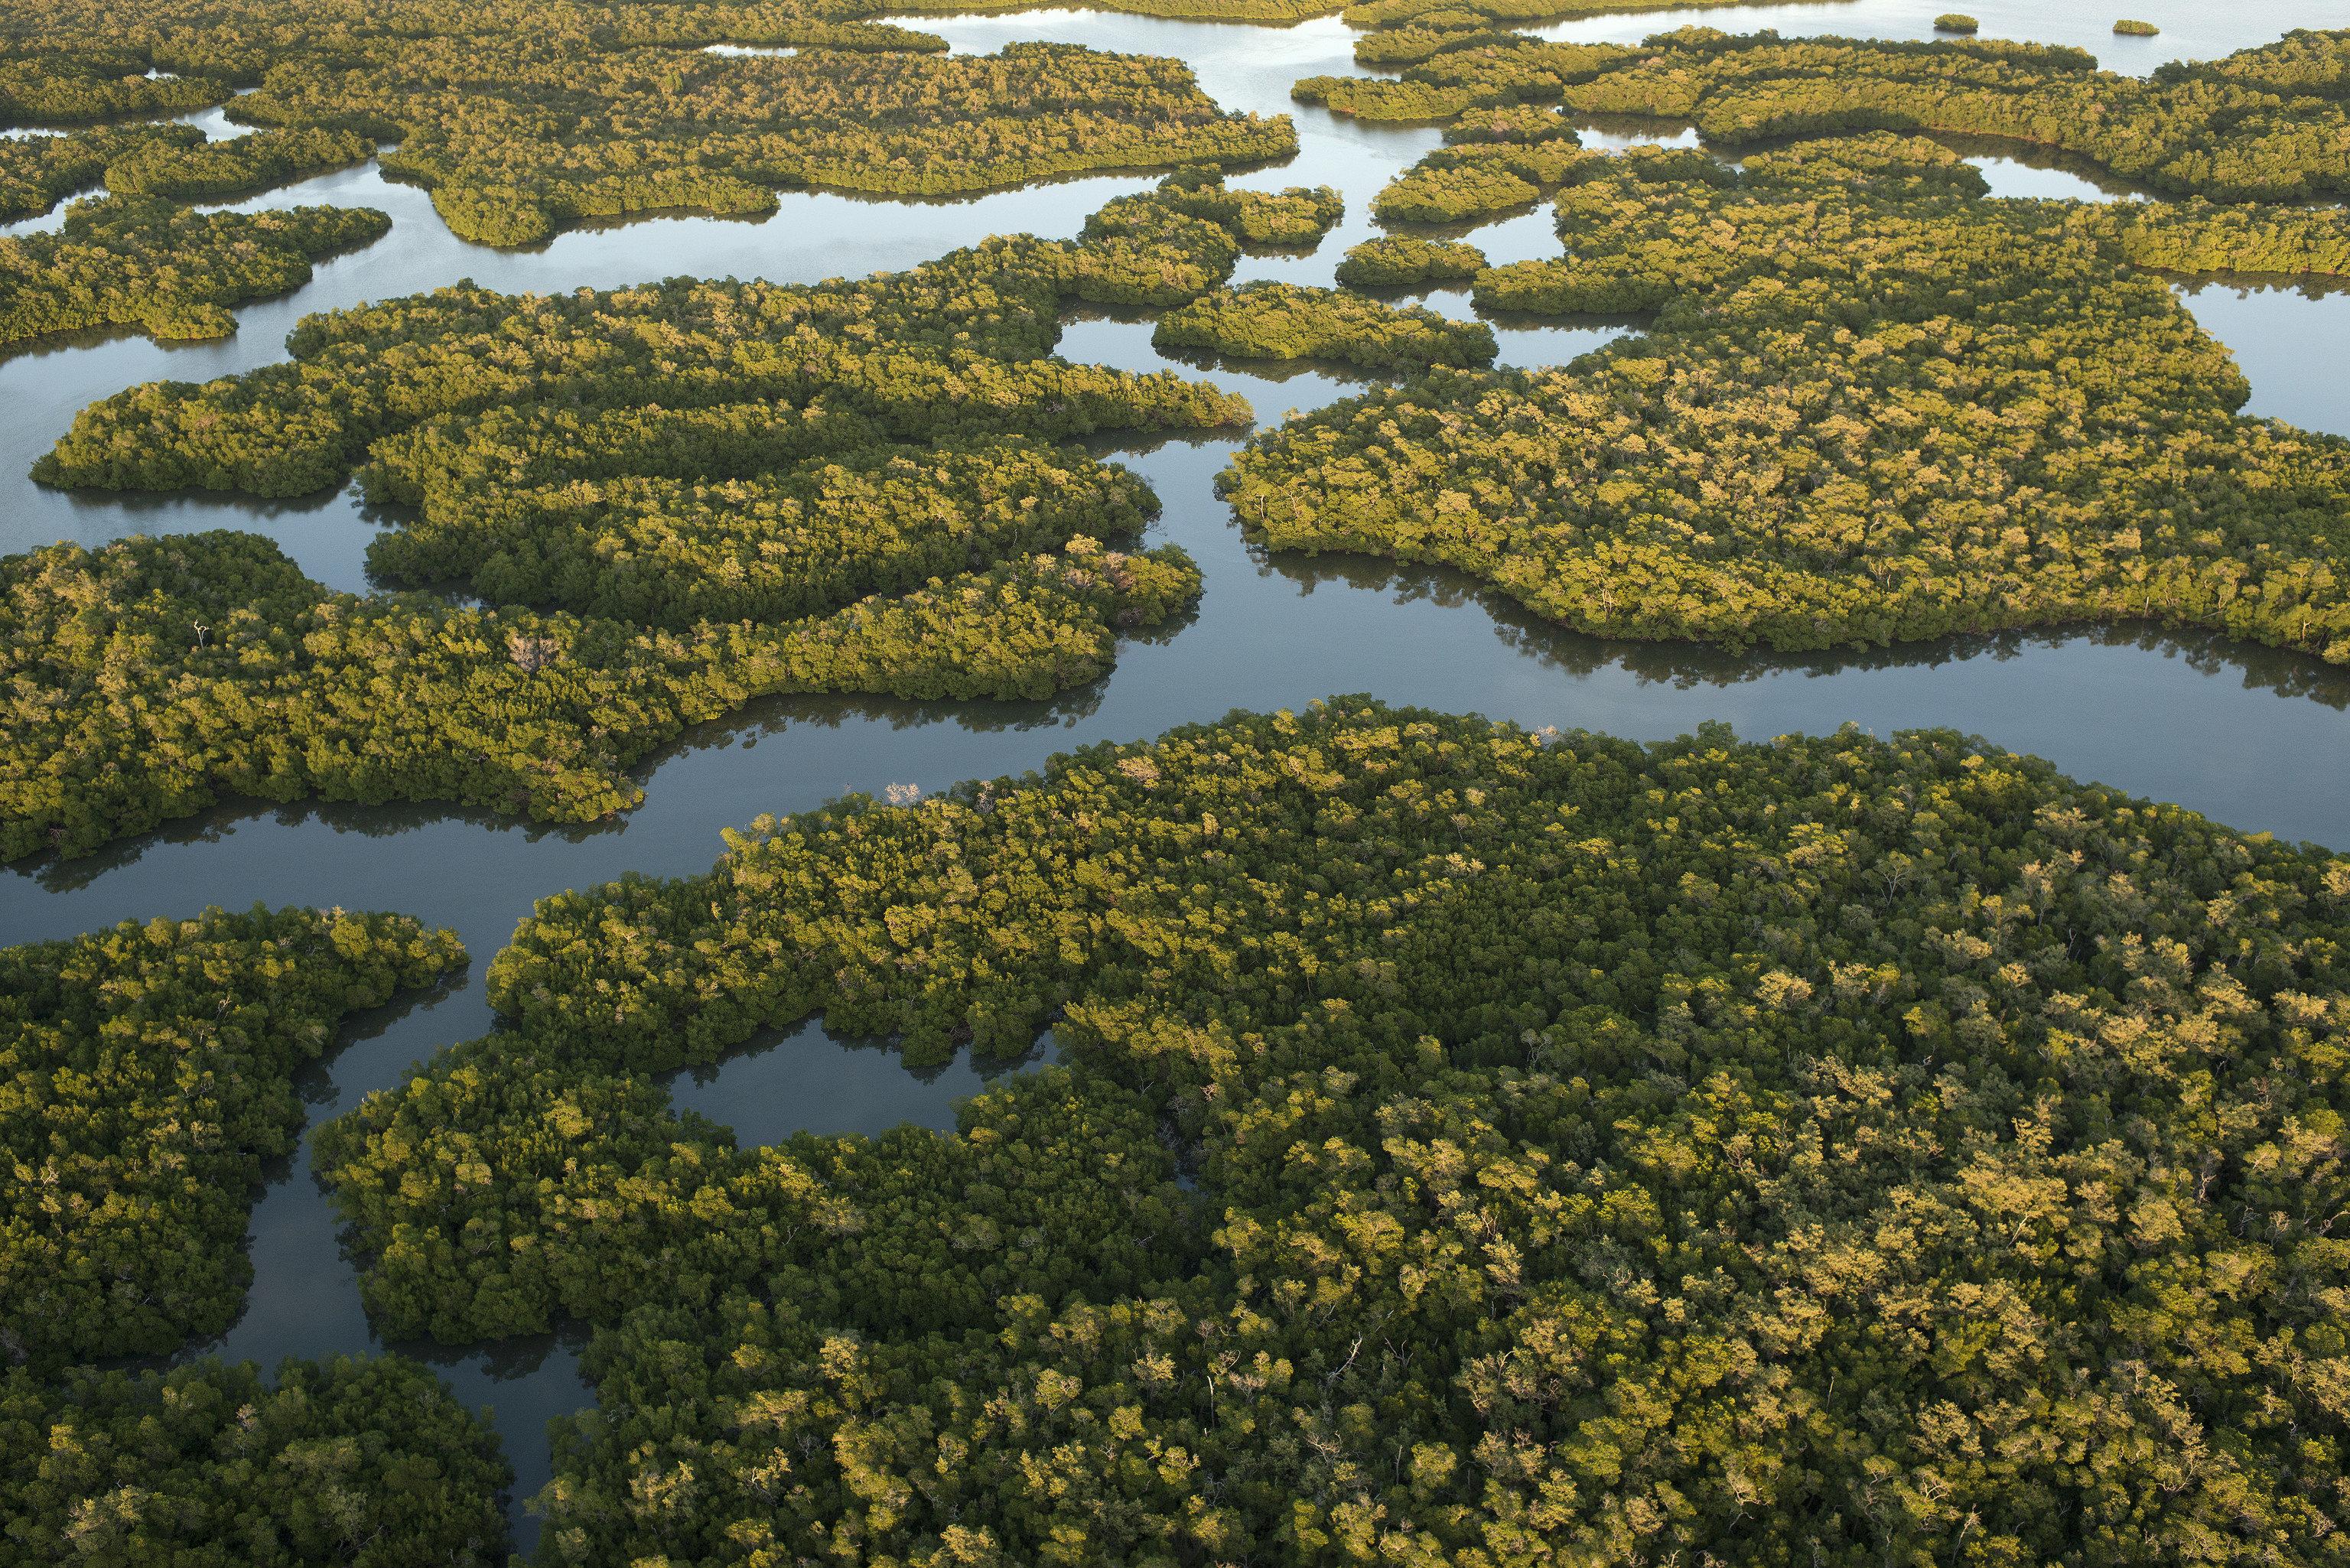 Trip Ideas habitat vegetation outdoor natural environment wilderness tree ecosystem plant tundra wetland River aerial photography flower algae